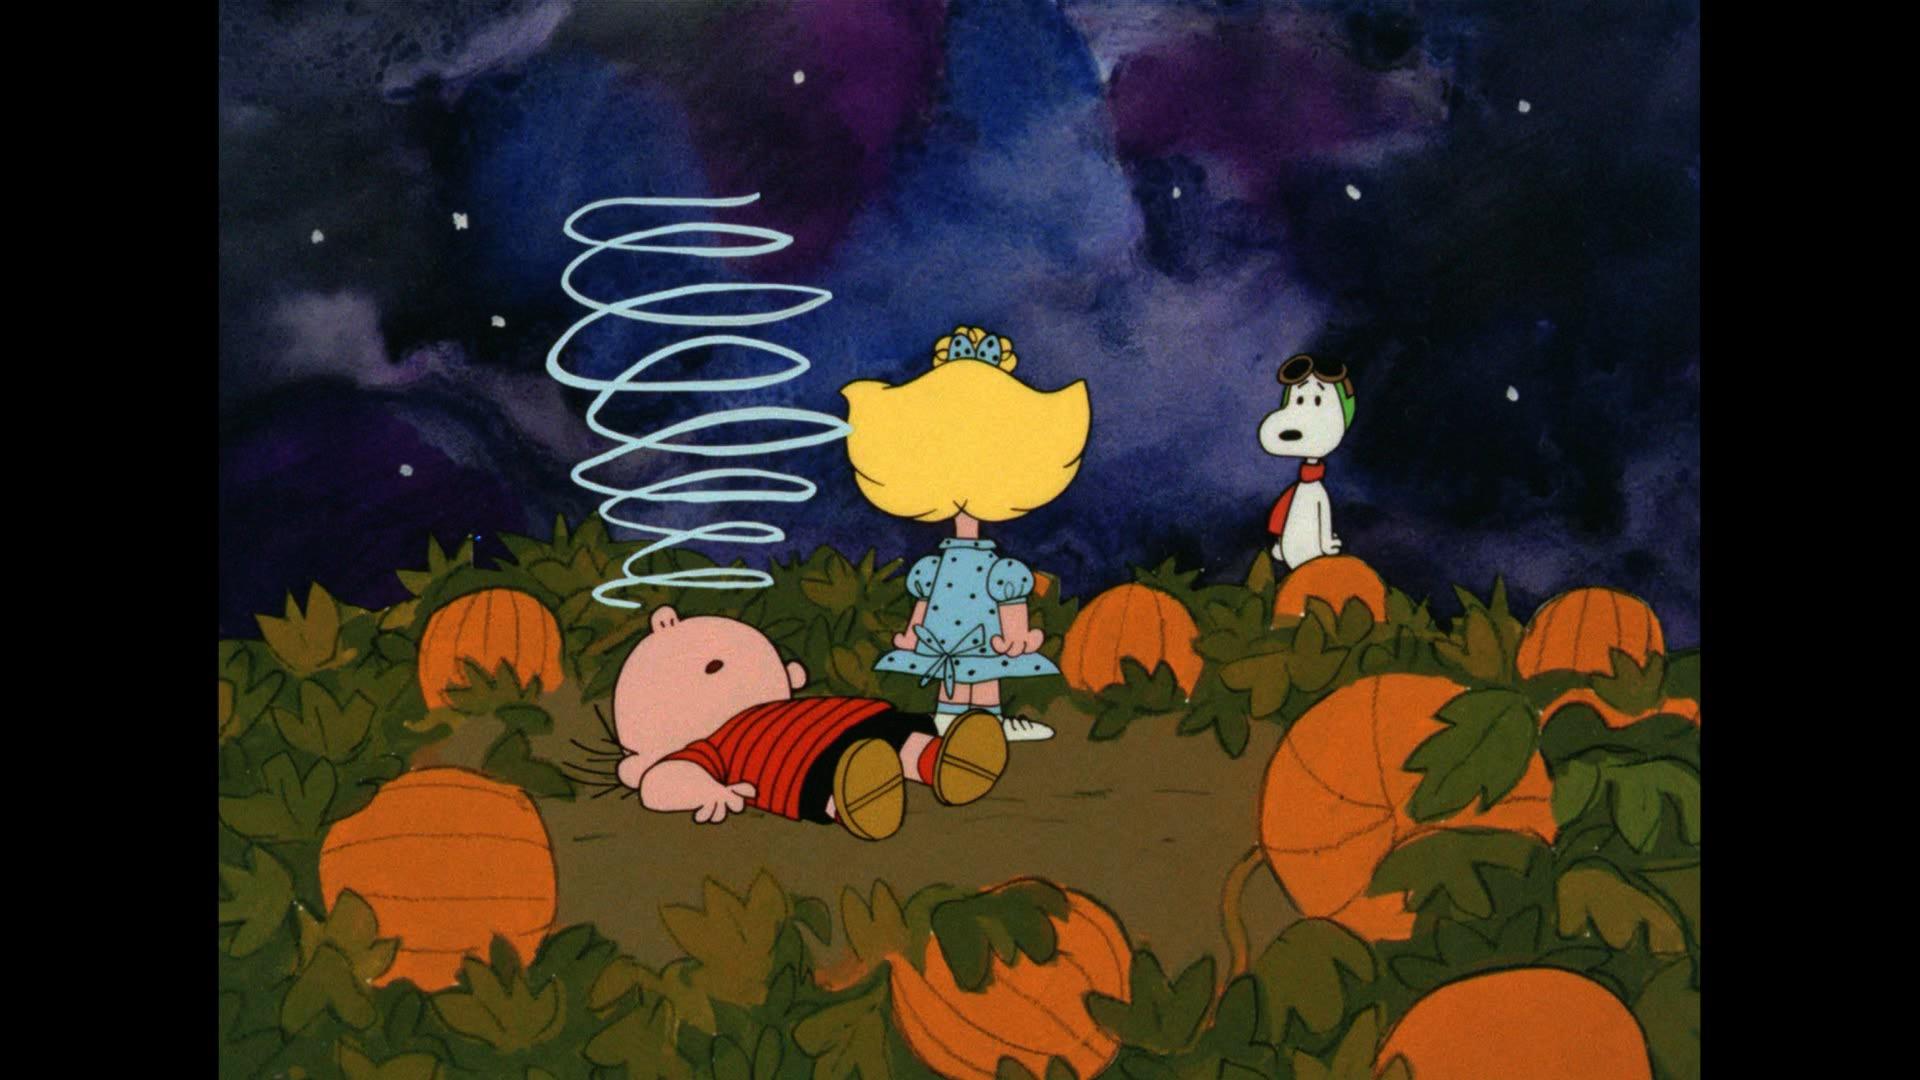 Great Pumpkin Charlie Brown Hd Backgrounds - Great Pumpkin Charlie Brown Desktop - HD Wallpaper